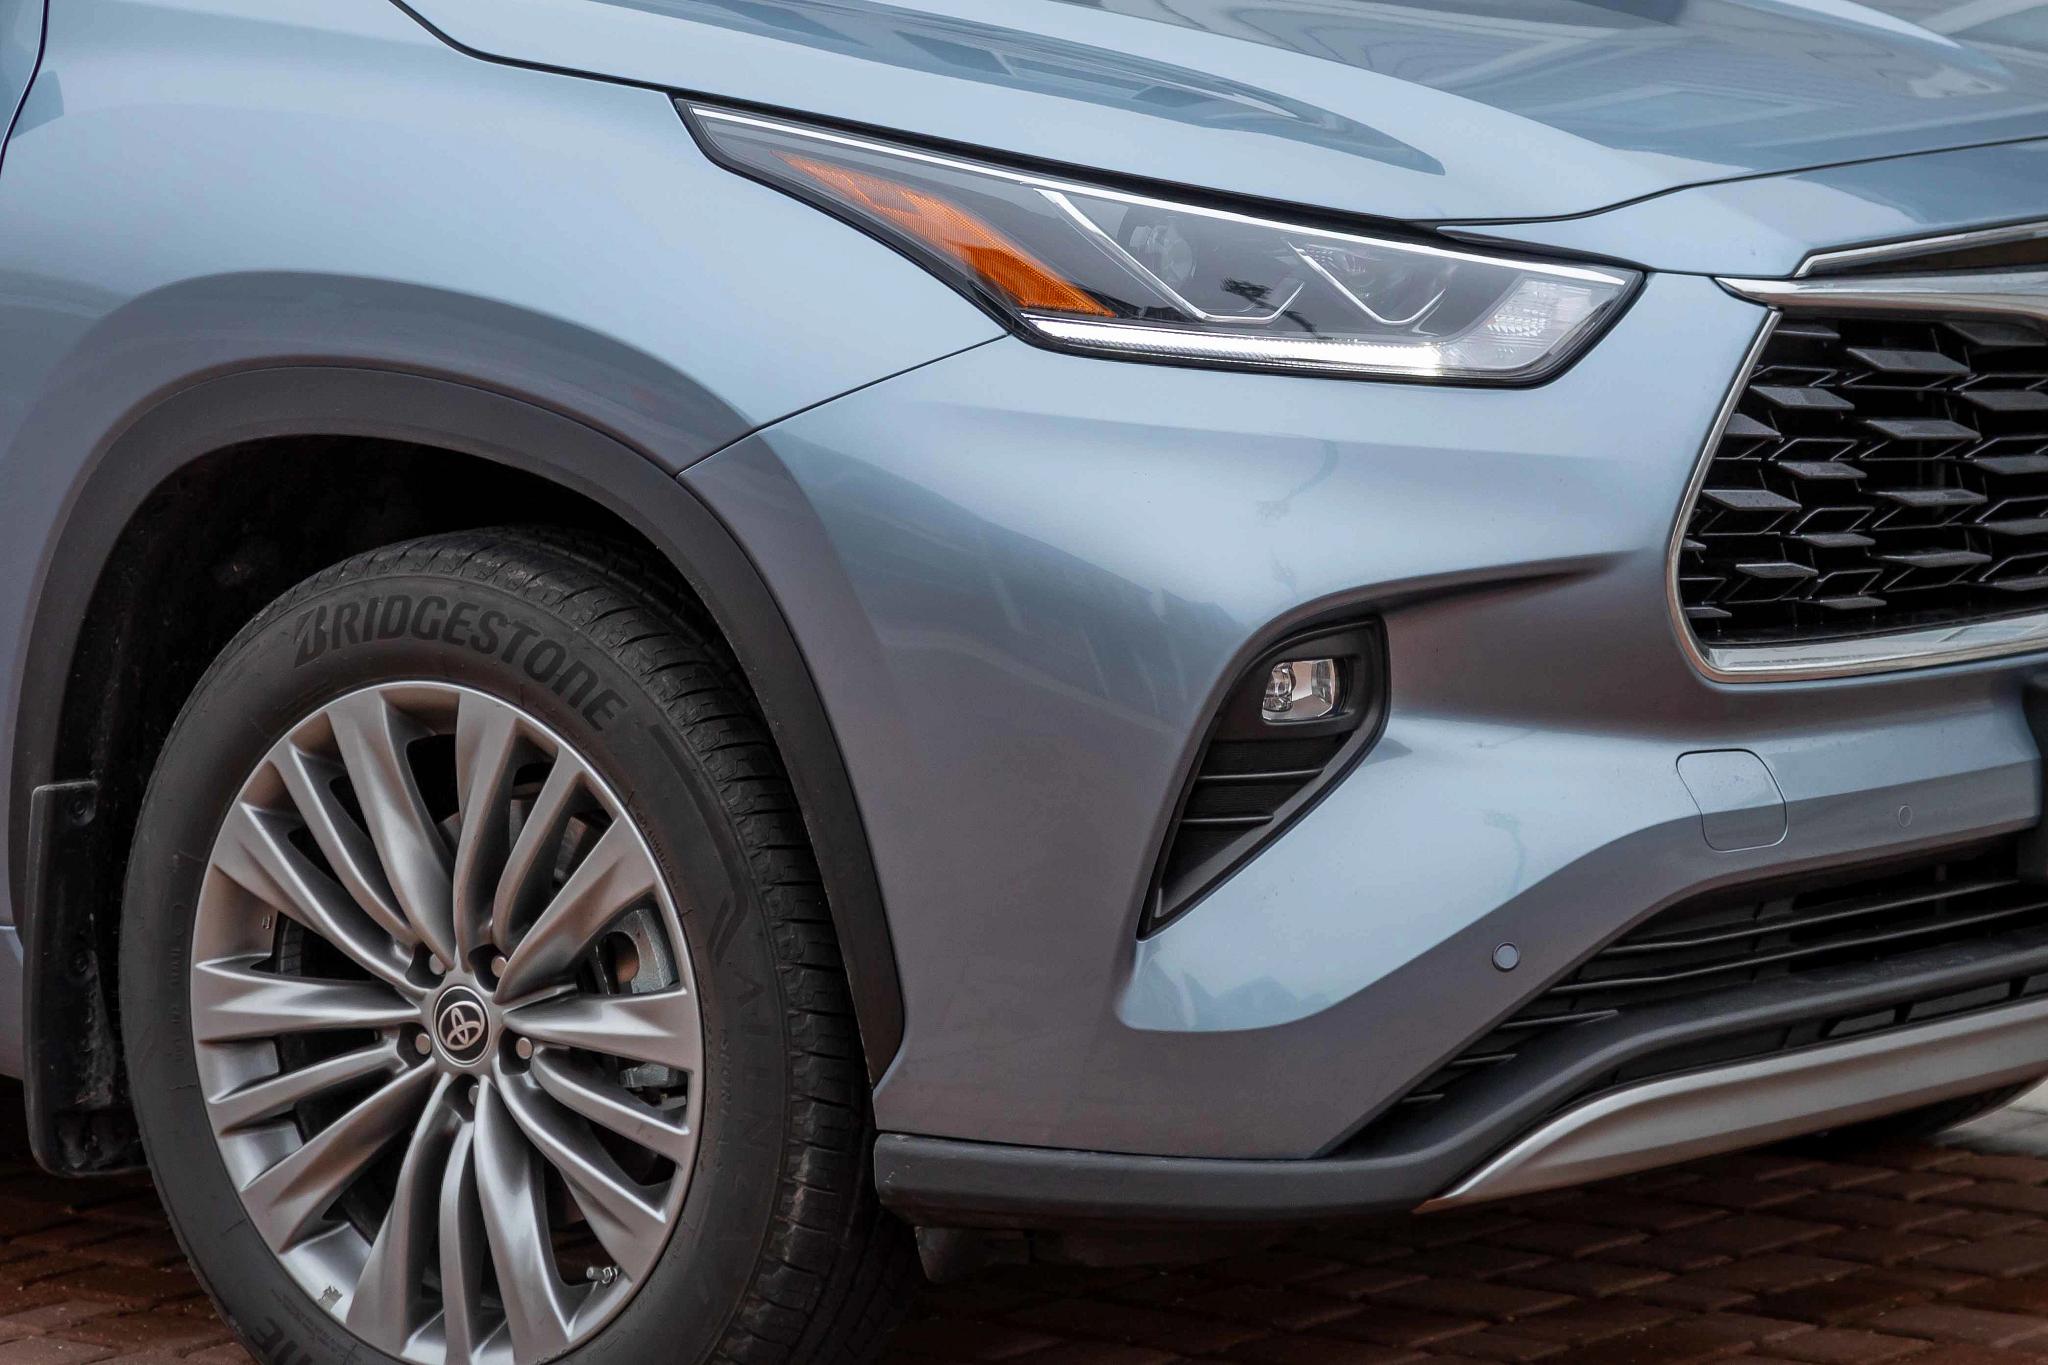 10 Biggest News Stories of the Week: Hyundai Palisade Vs. Toyota Highlander … Vs. Coronavirus Car Deals